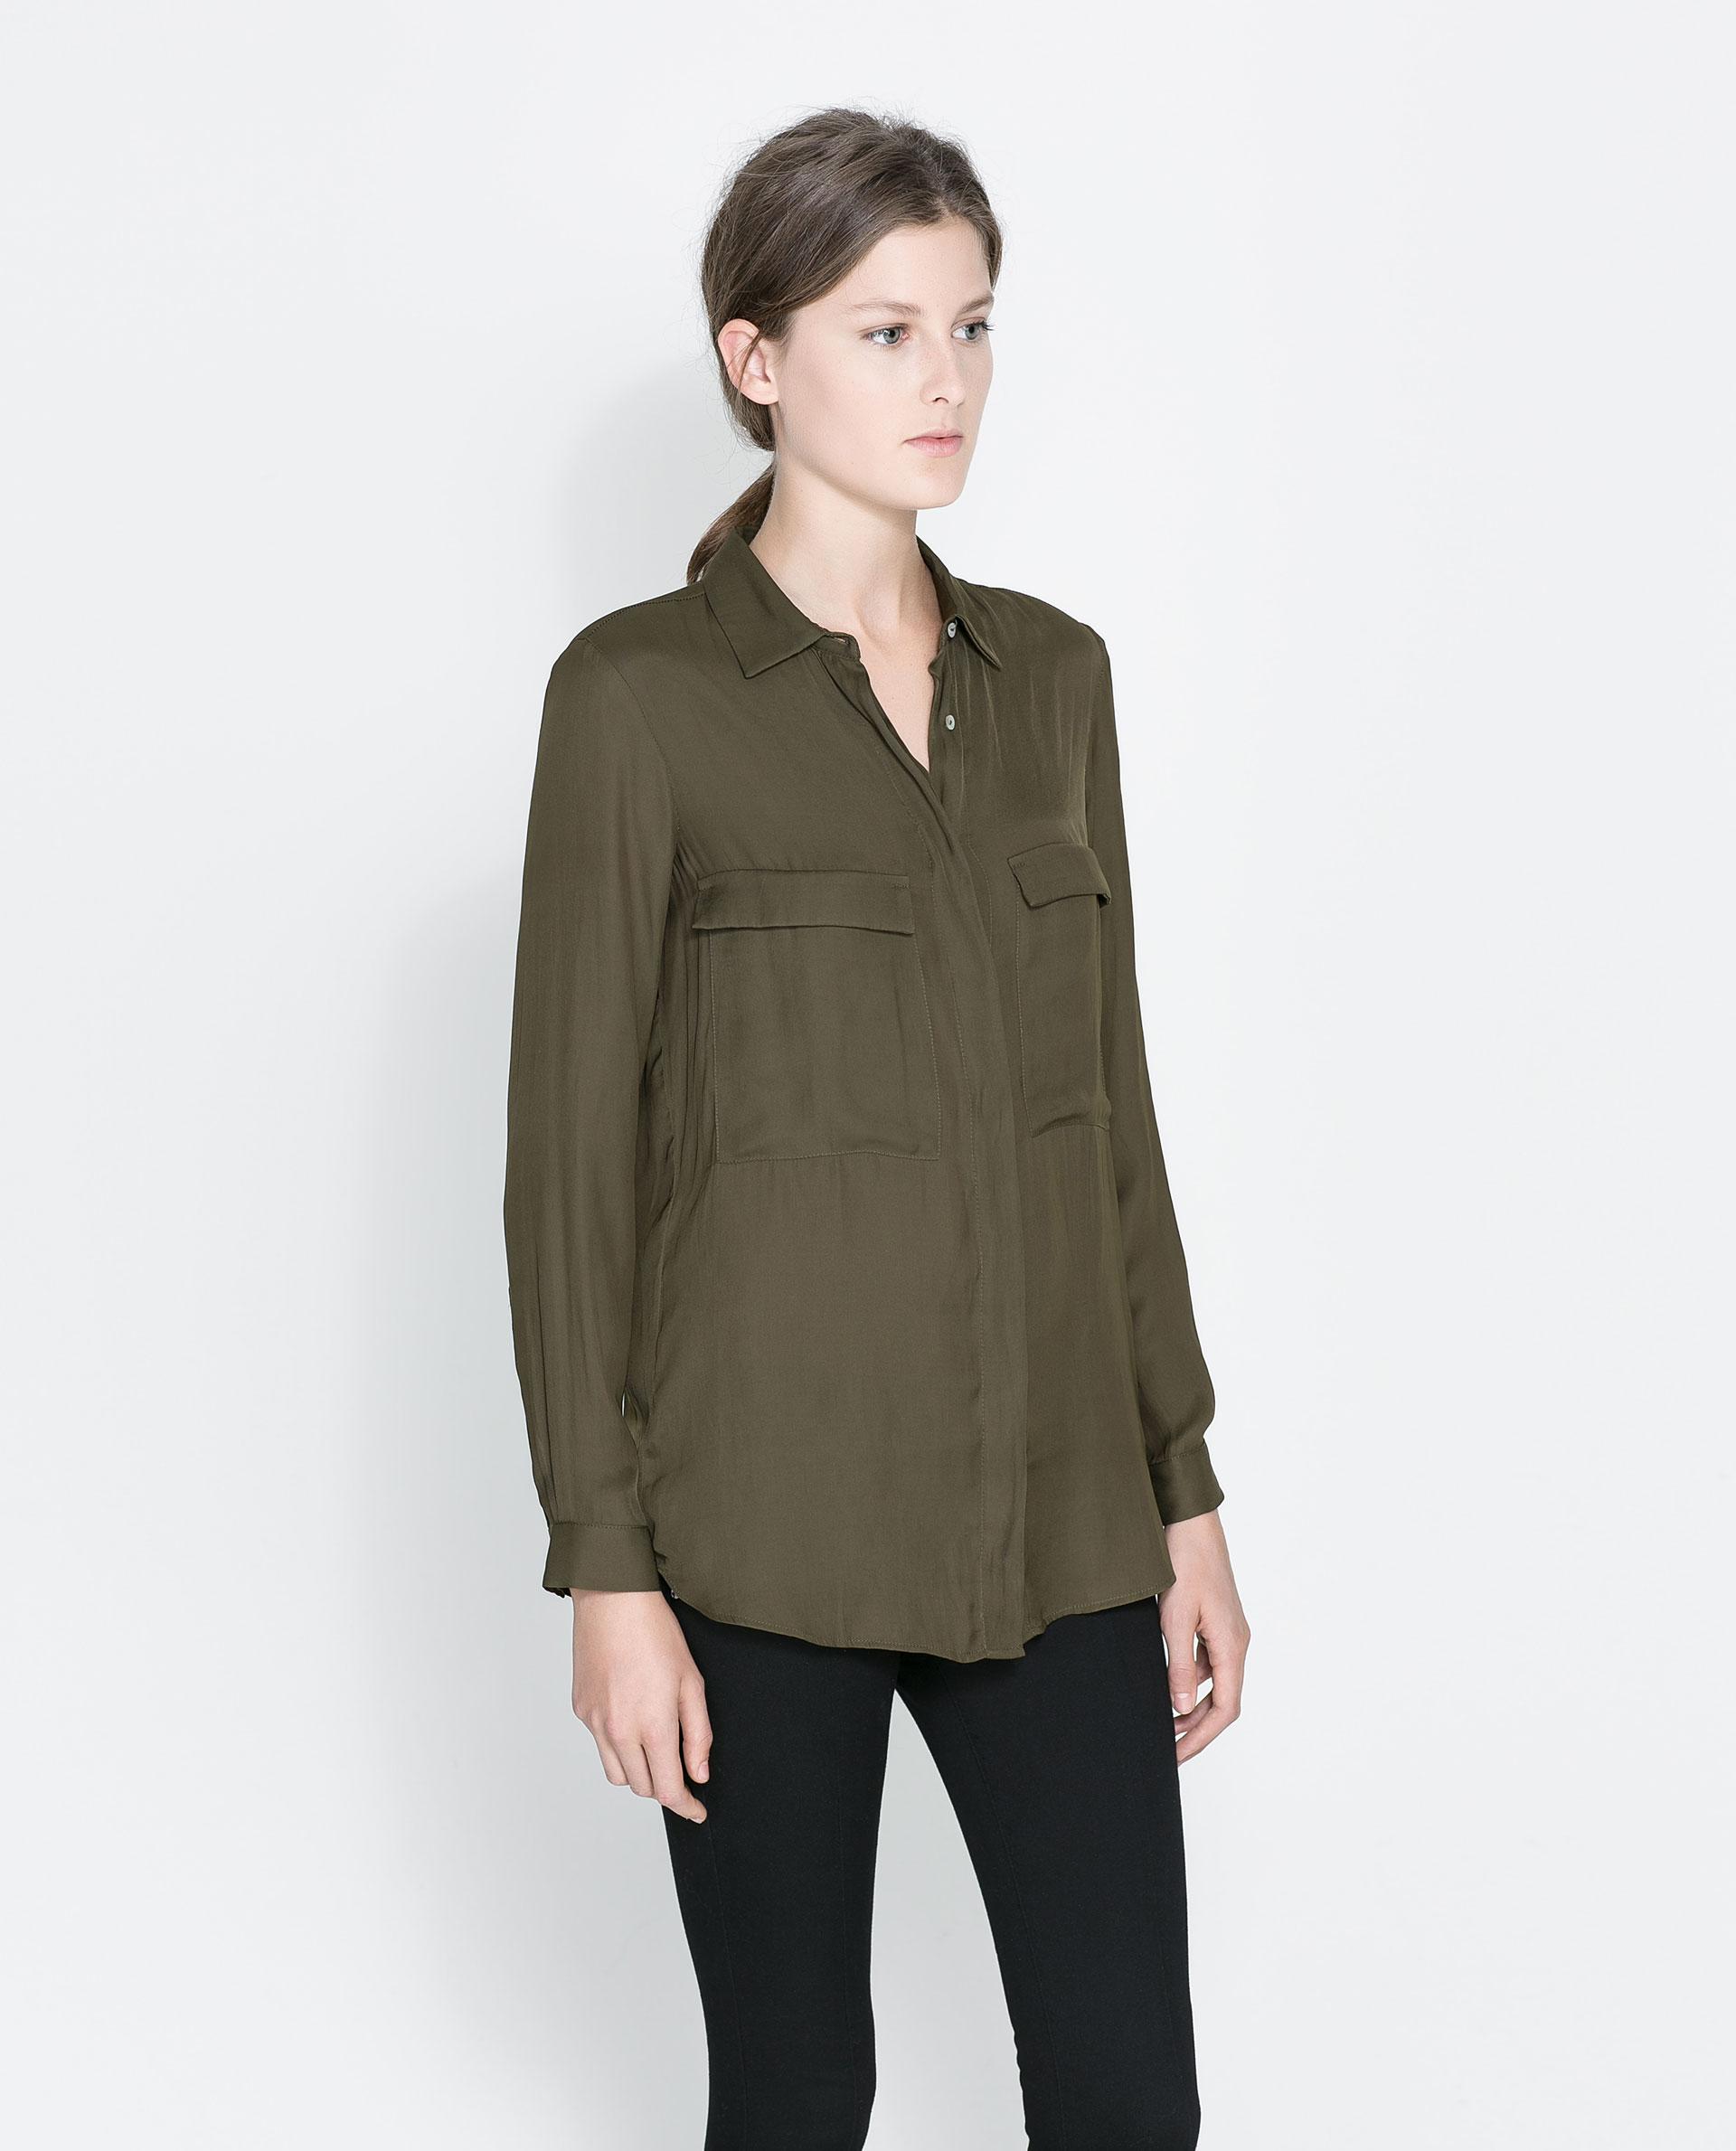 Zara Shirt Style Blouse 22